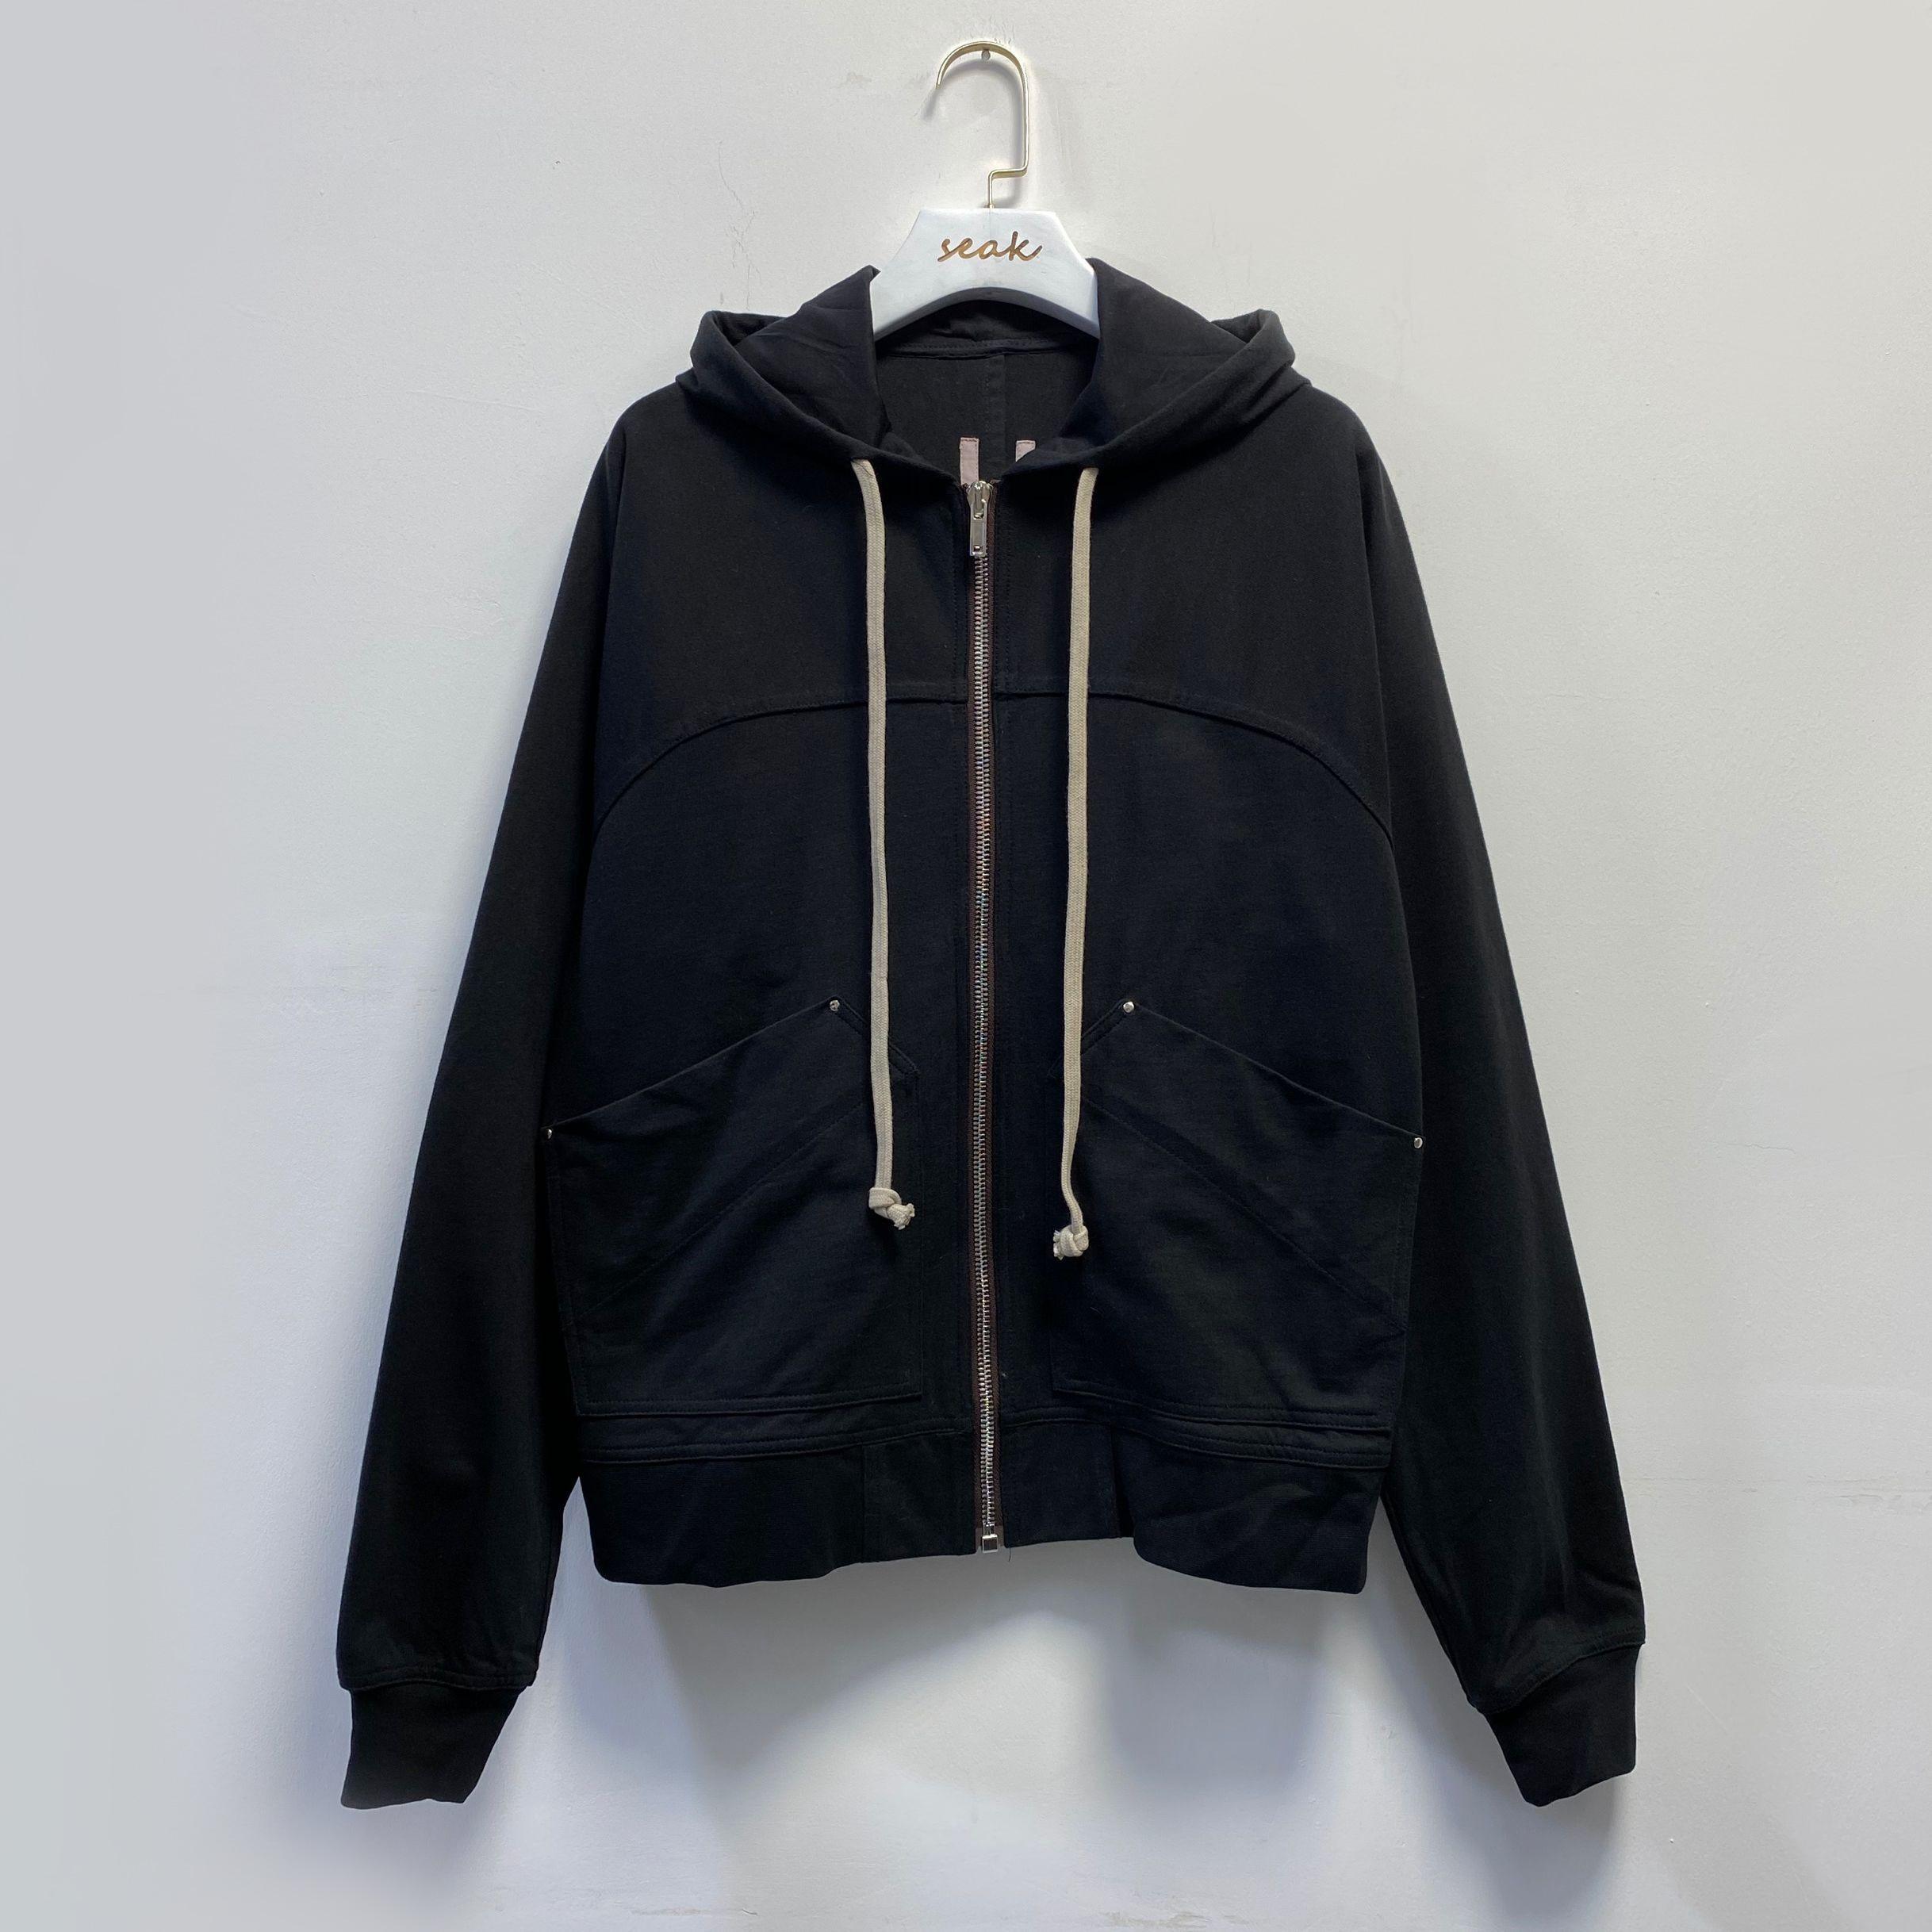 Owen Seak Men Cotton Hoodies Sweatshirts Gothic Men's Clothing Oversized Autumn High Street Hip Hop Women Black Zip Coat Jacket